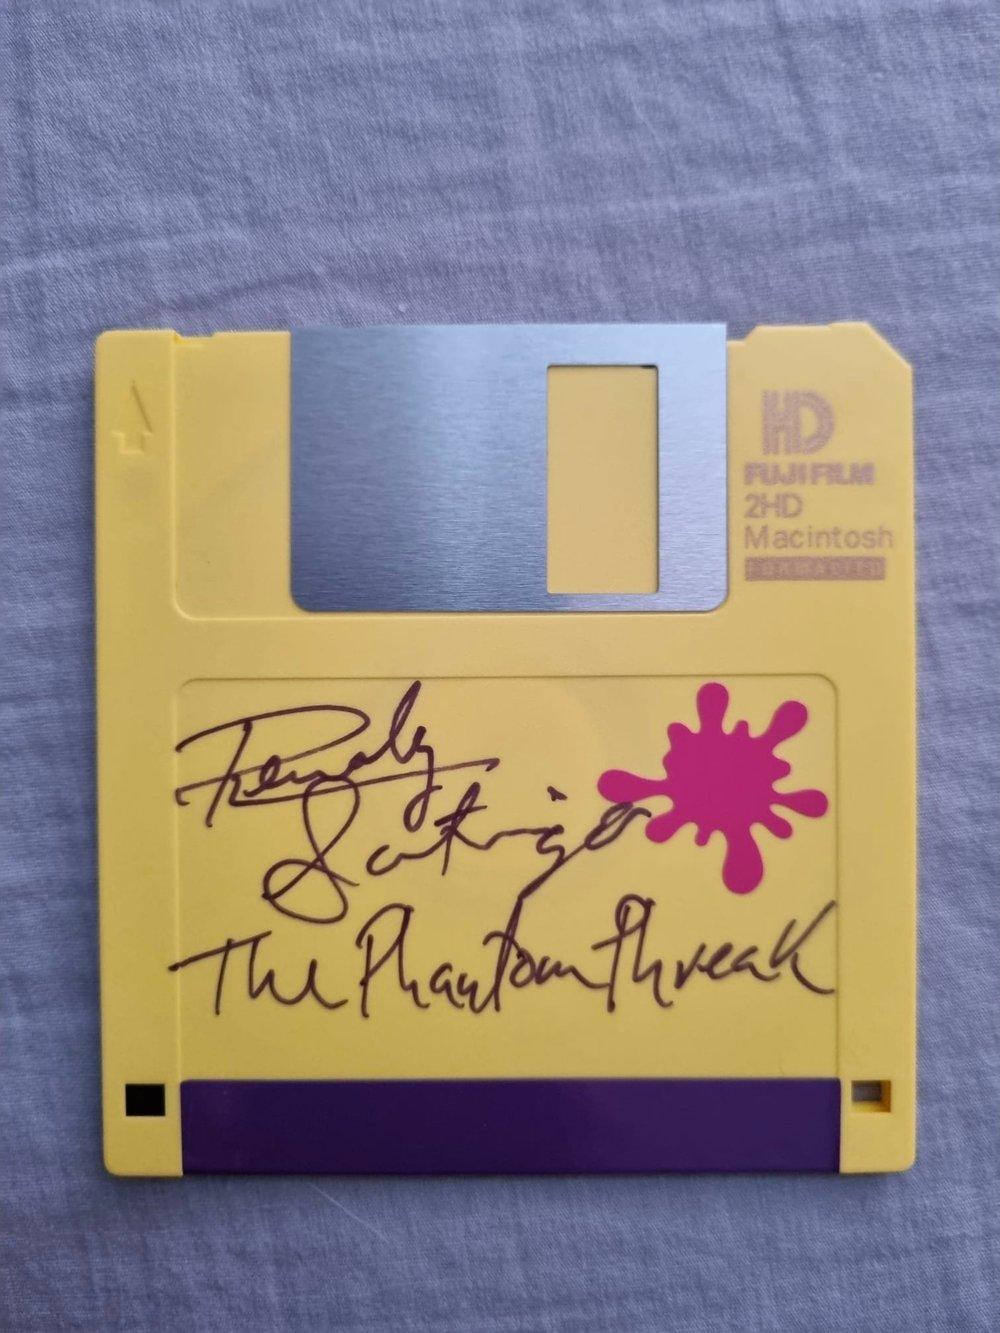 Renoly Santiago Signed Hackers Floppy Disk